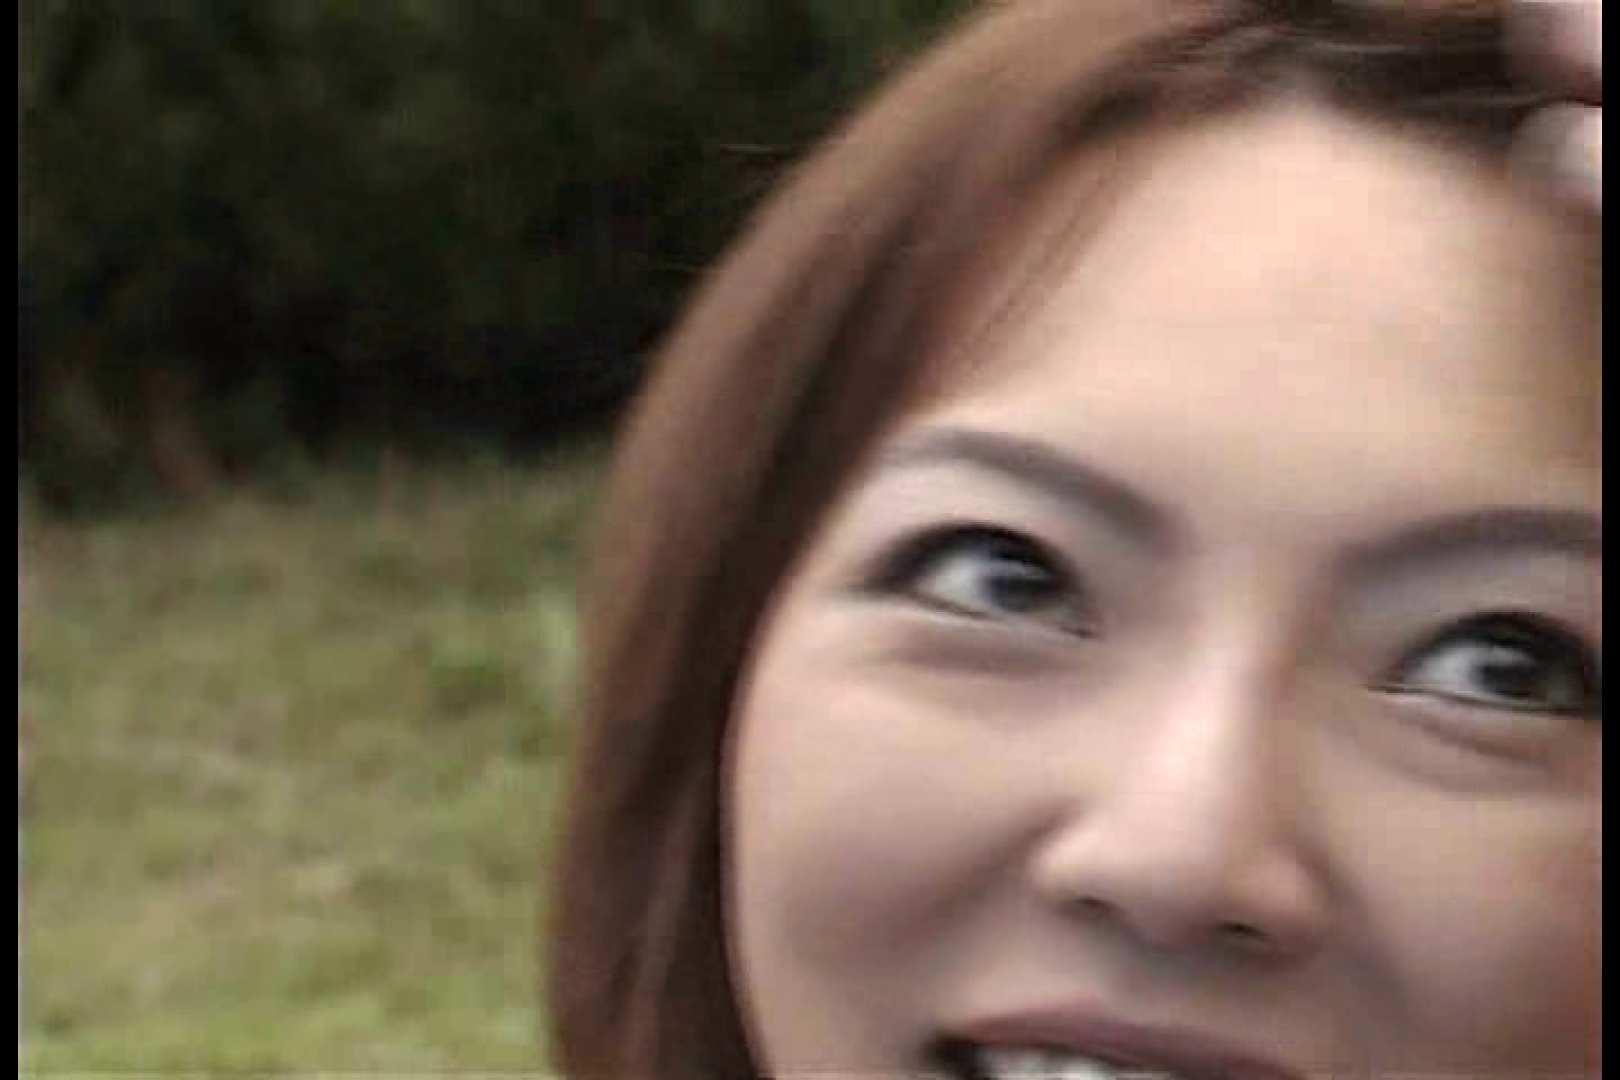 RQカメラ地獄Vol.4 マンコ映像  73連発 45